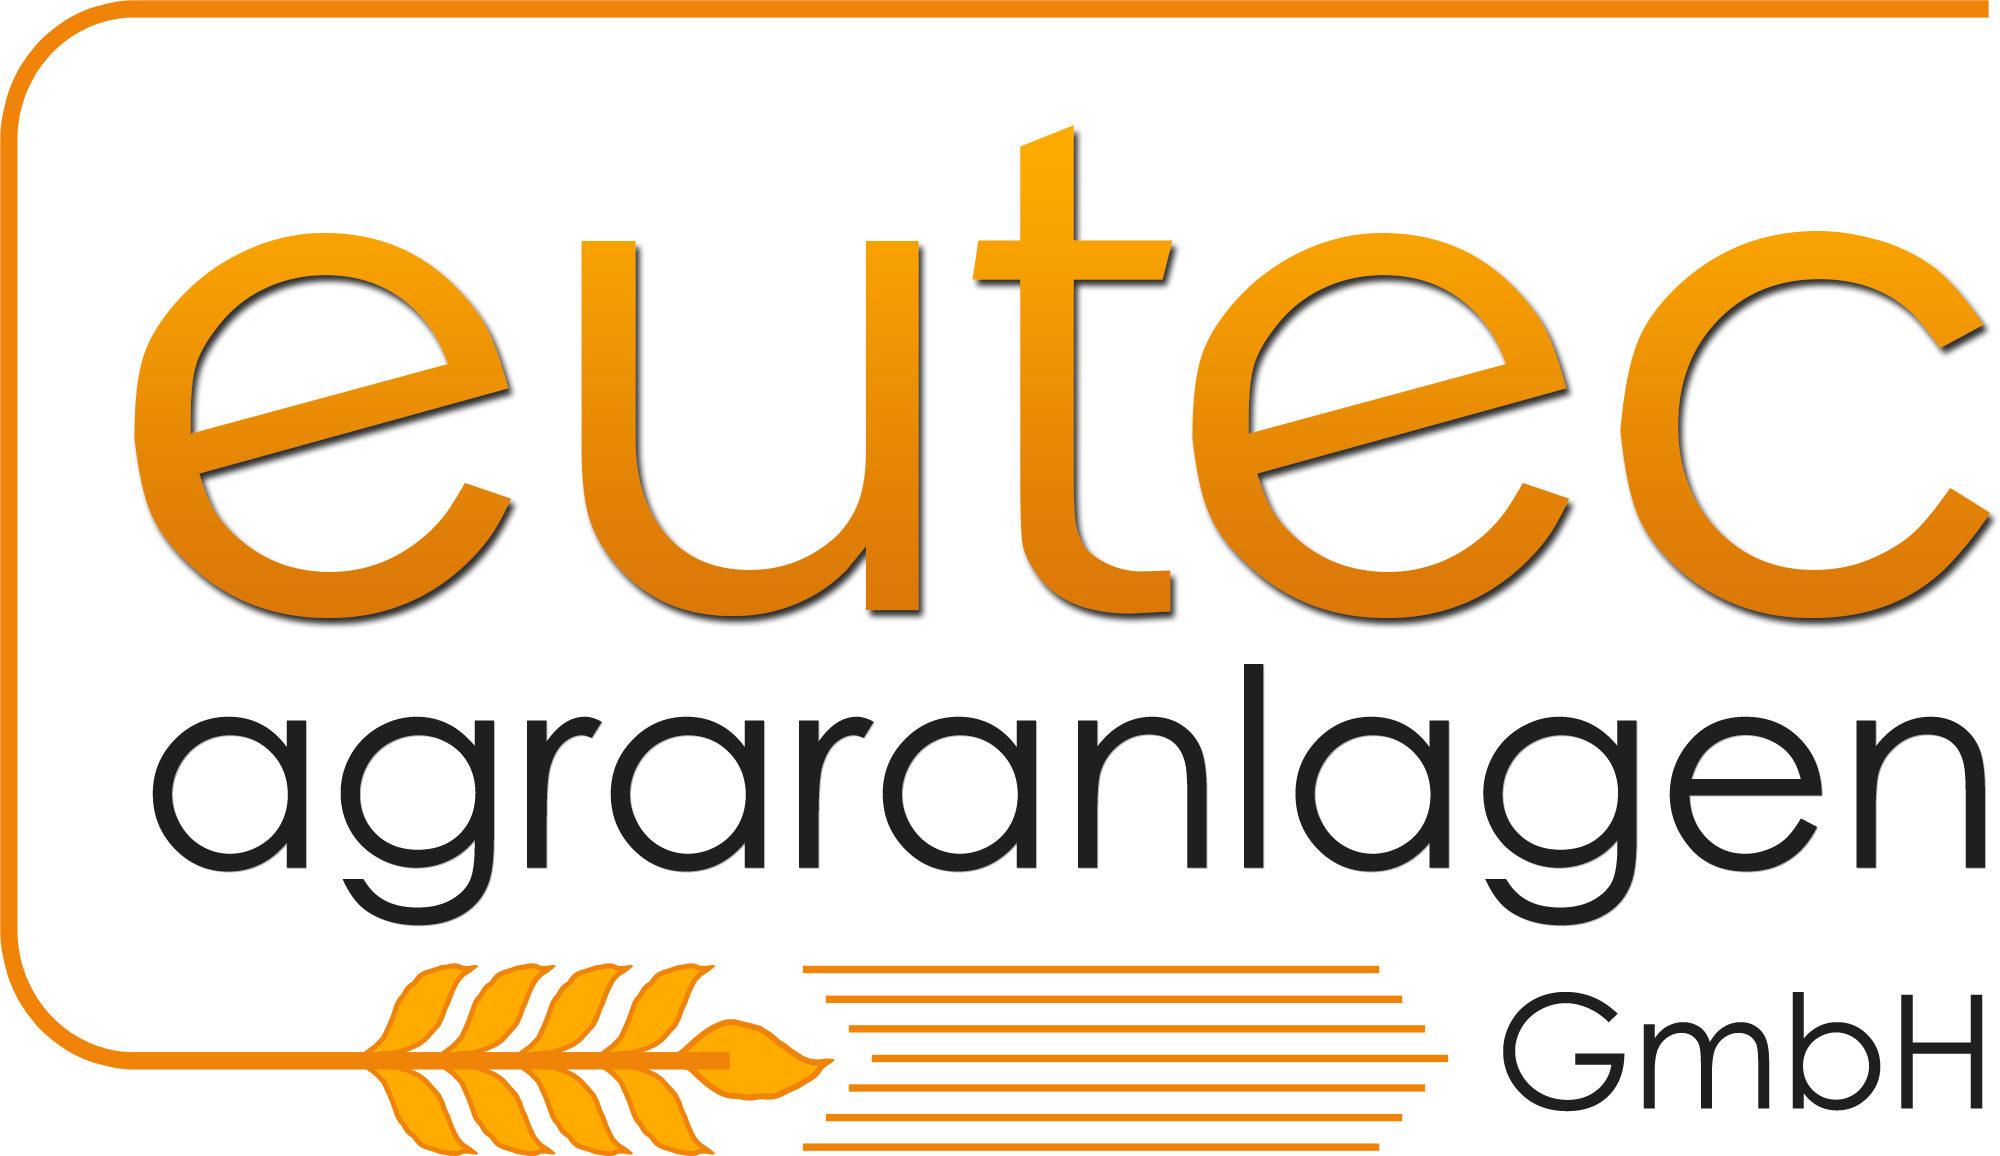 eutec agraranlagen GmbH